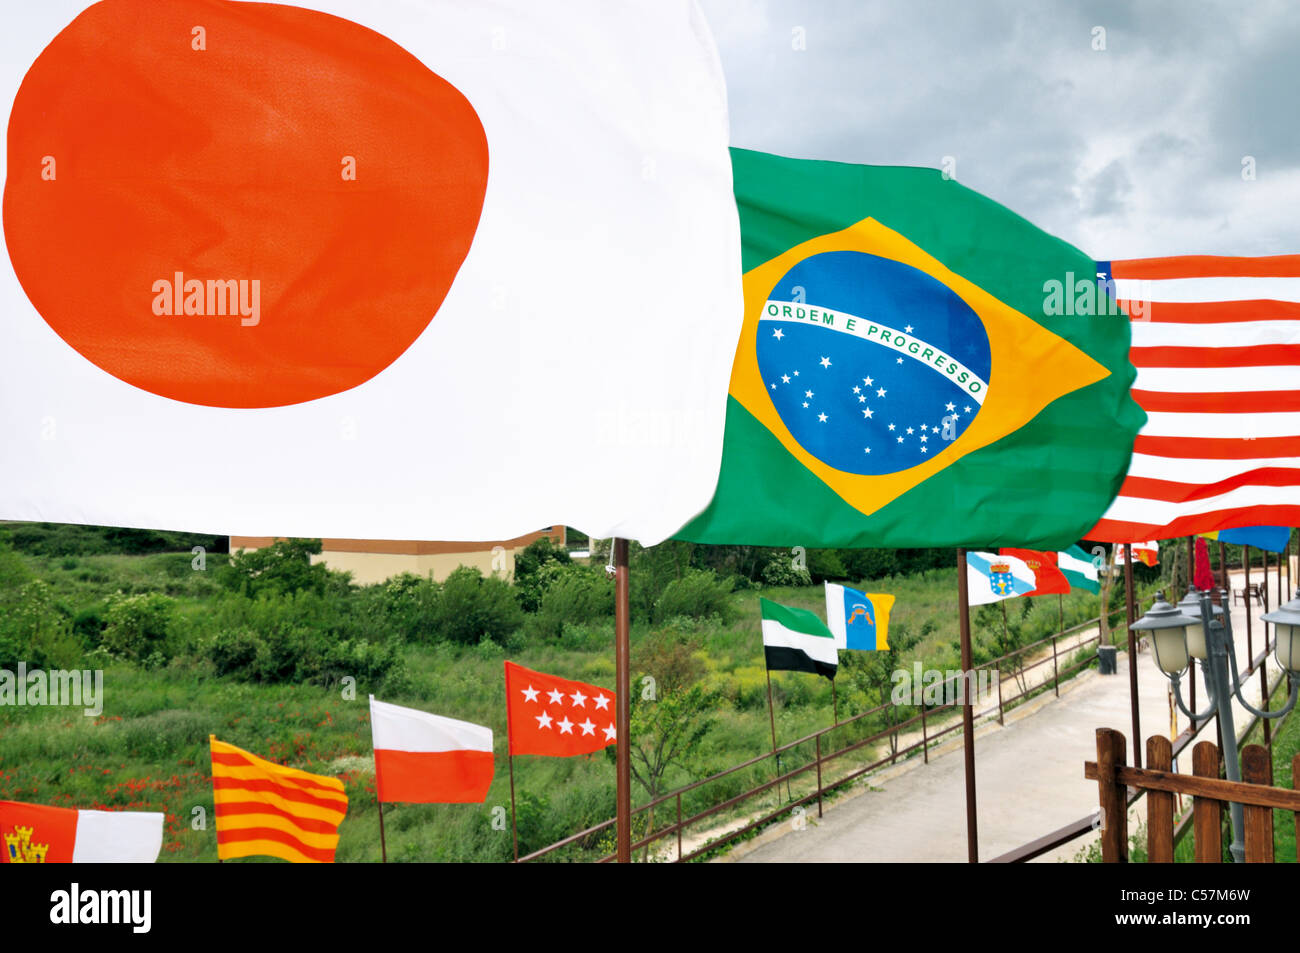 Spain, St. James Way: Nation flags at the pilgrims hostel 'Albergue A Santiago' in Belorado - Stock Image